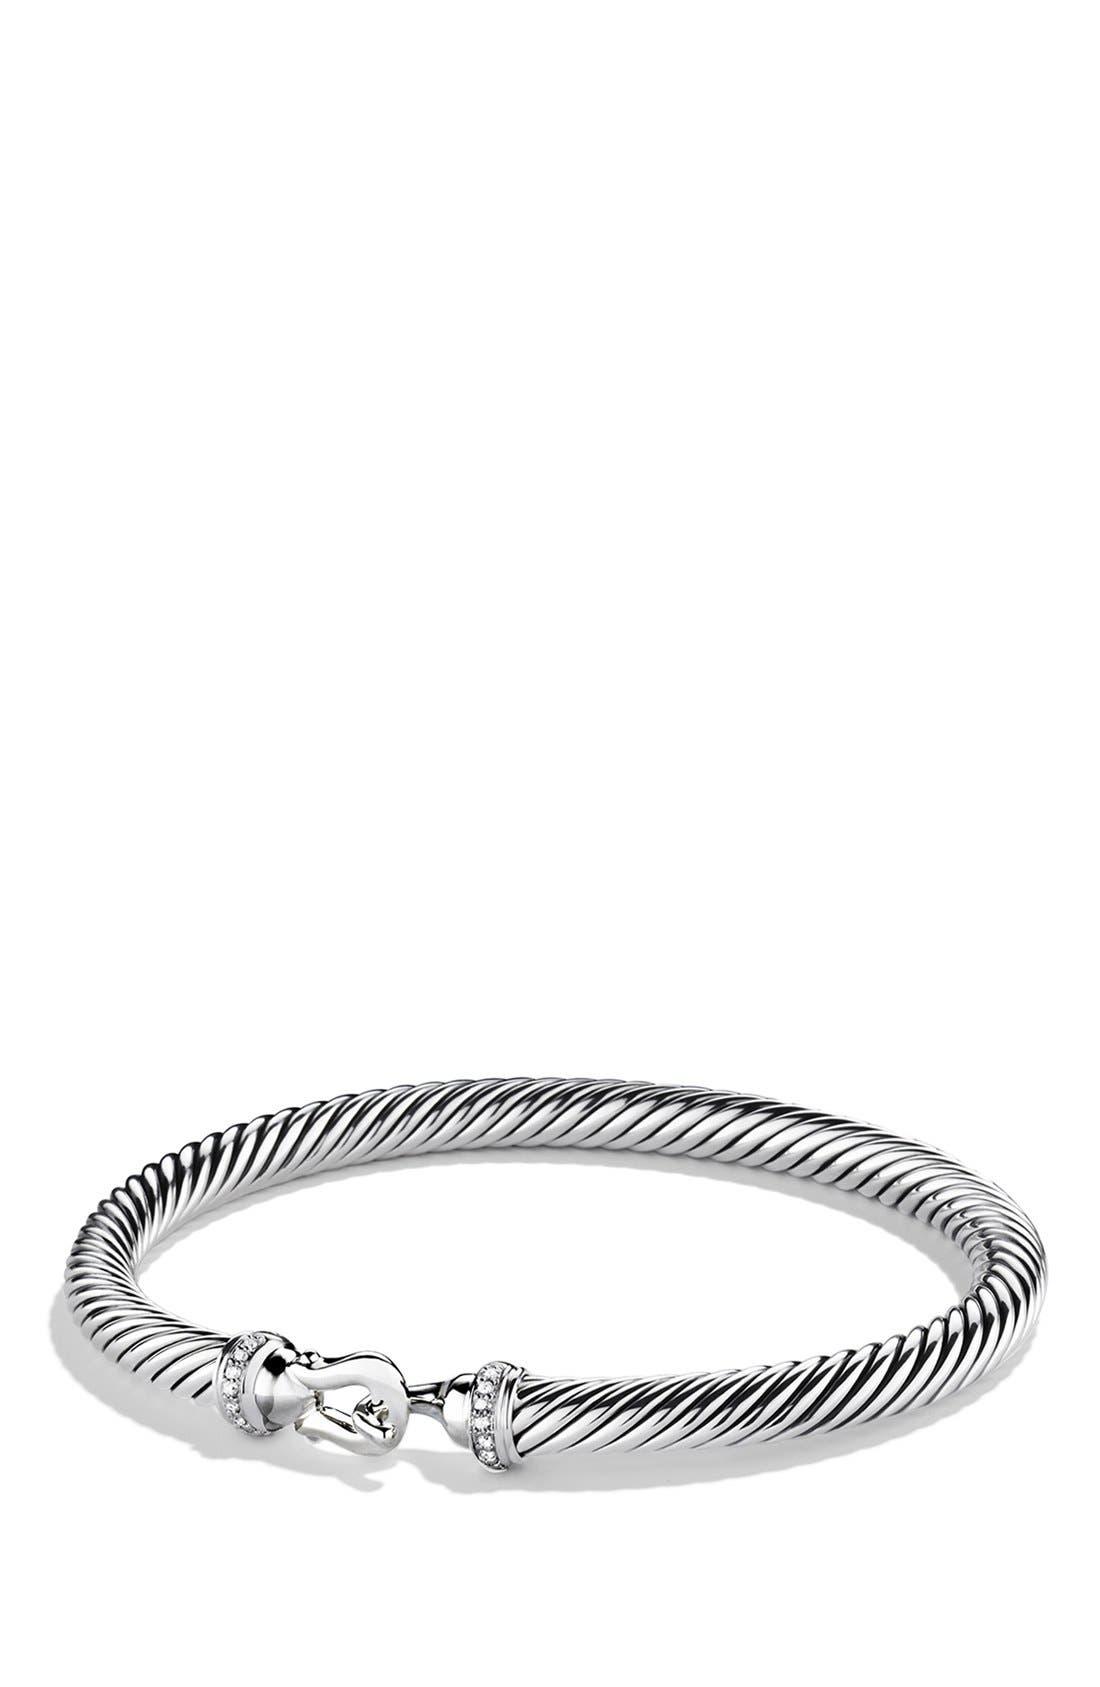 Main Image - David Yurman 'Cable Buckle' Bracelet with Diamonds